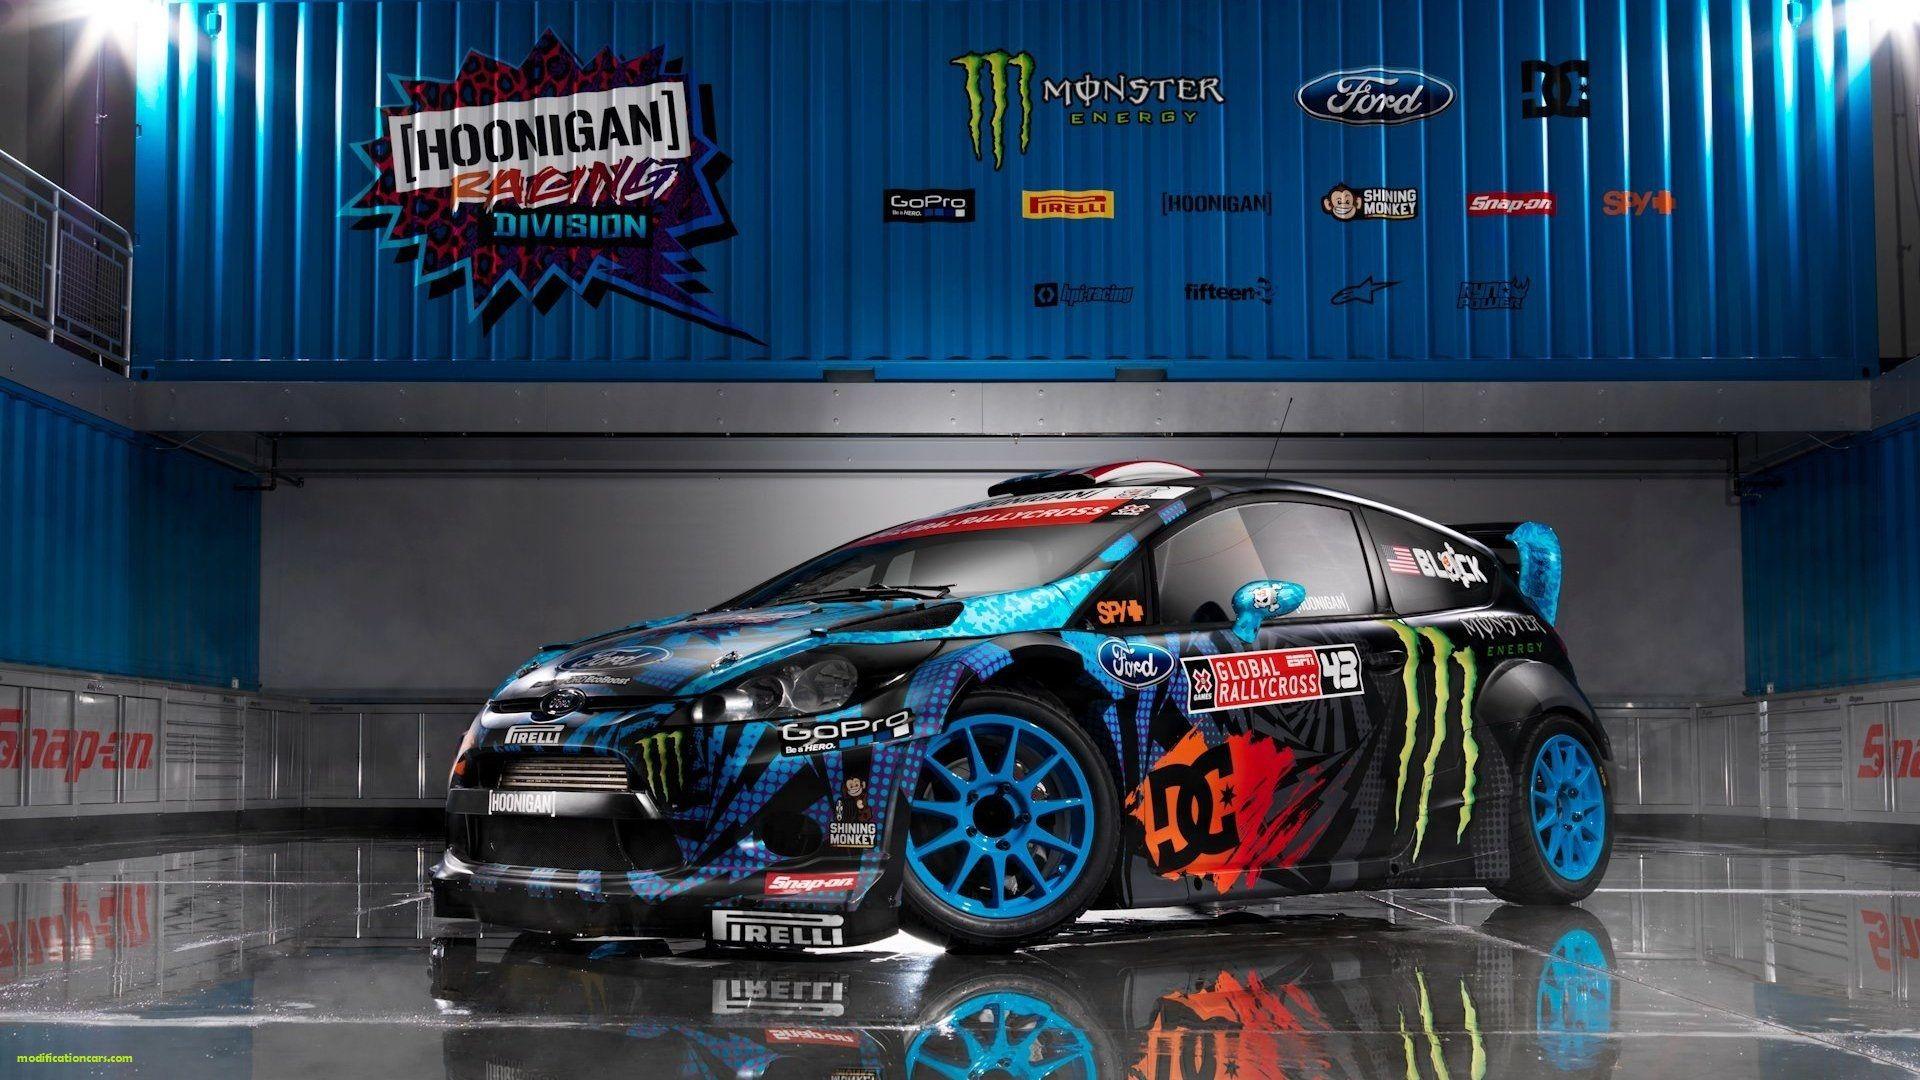 Ford Fiesta RS WRC 2013 Modification Monster Energi HD Wallpaper